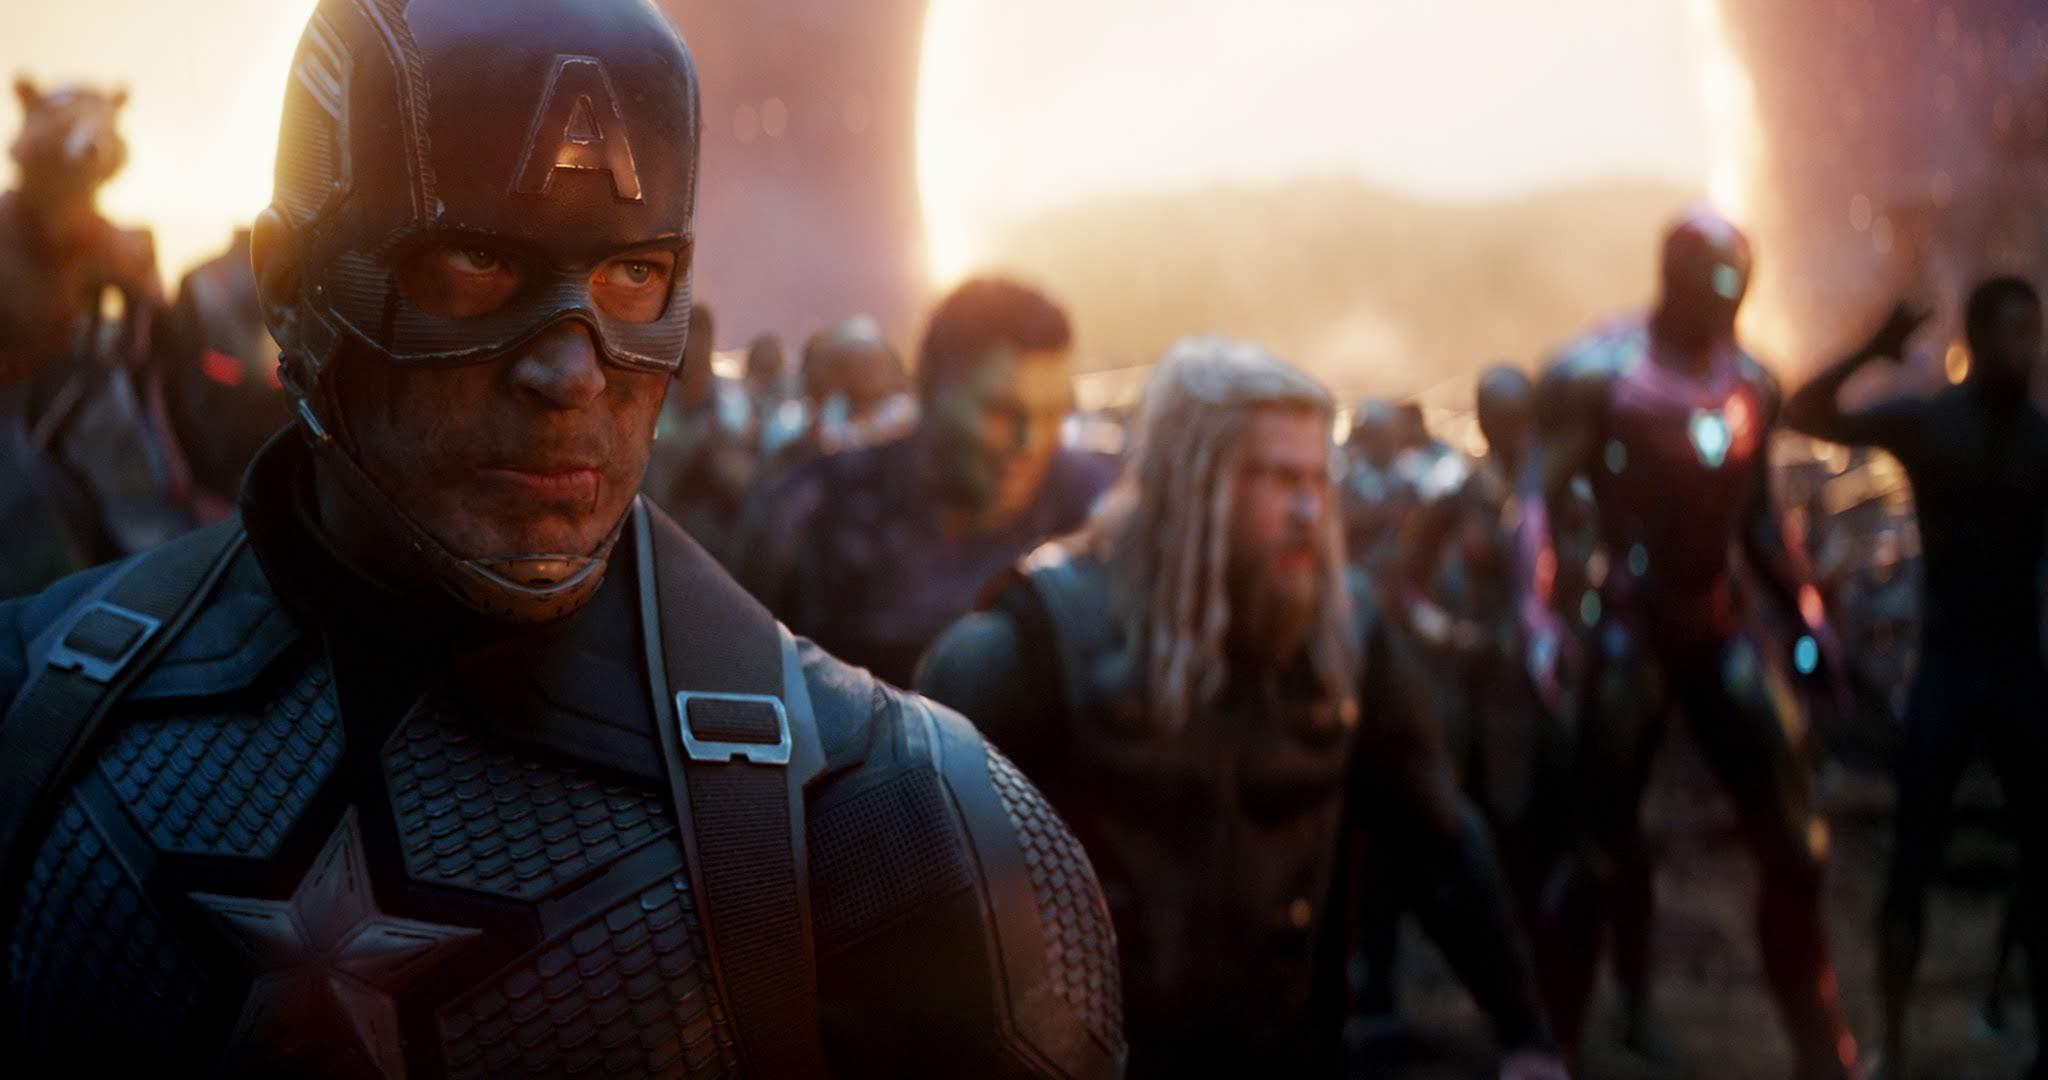 Marvel edit by Ash Arnold: 今年2019年も最も楽しませてくれたのは、やっぱり、マーベル ! ! と言えそうなシネマティック・ユニバースにトリビュートした約1分間のクールなビデオ ! !